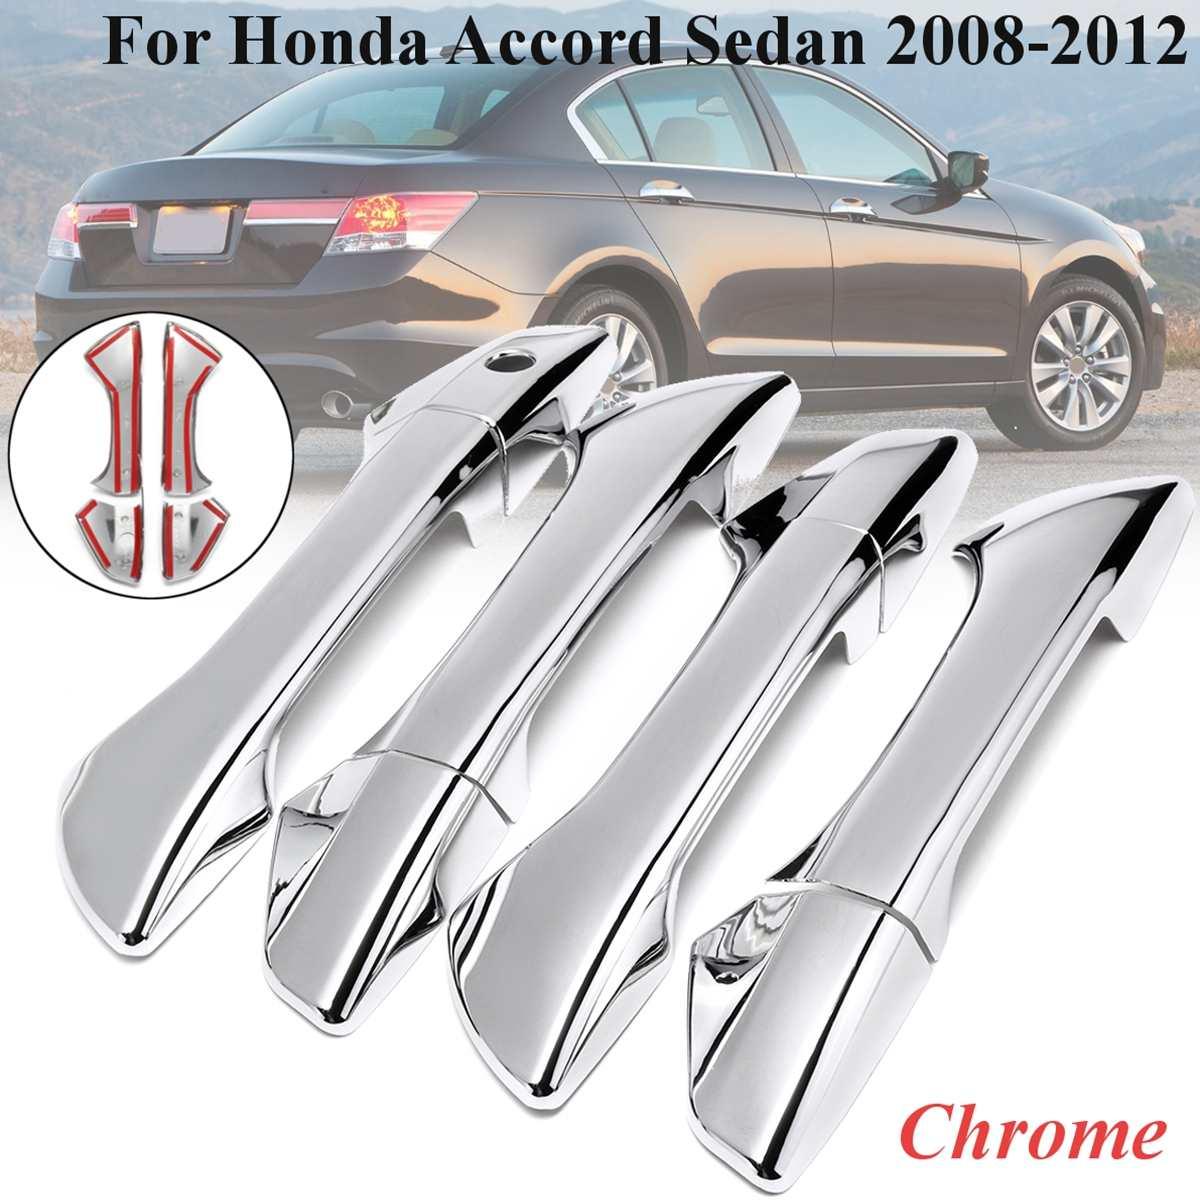 NEW 2008 2009 2010 2011 2012 Honda Accord Chrome 4  Door Handle Covers Trim 08